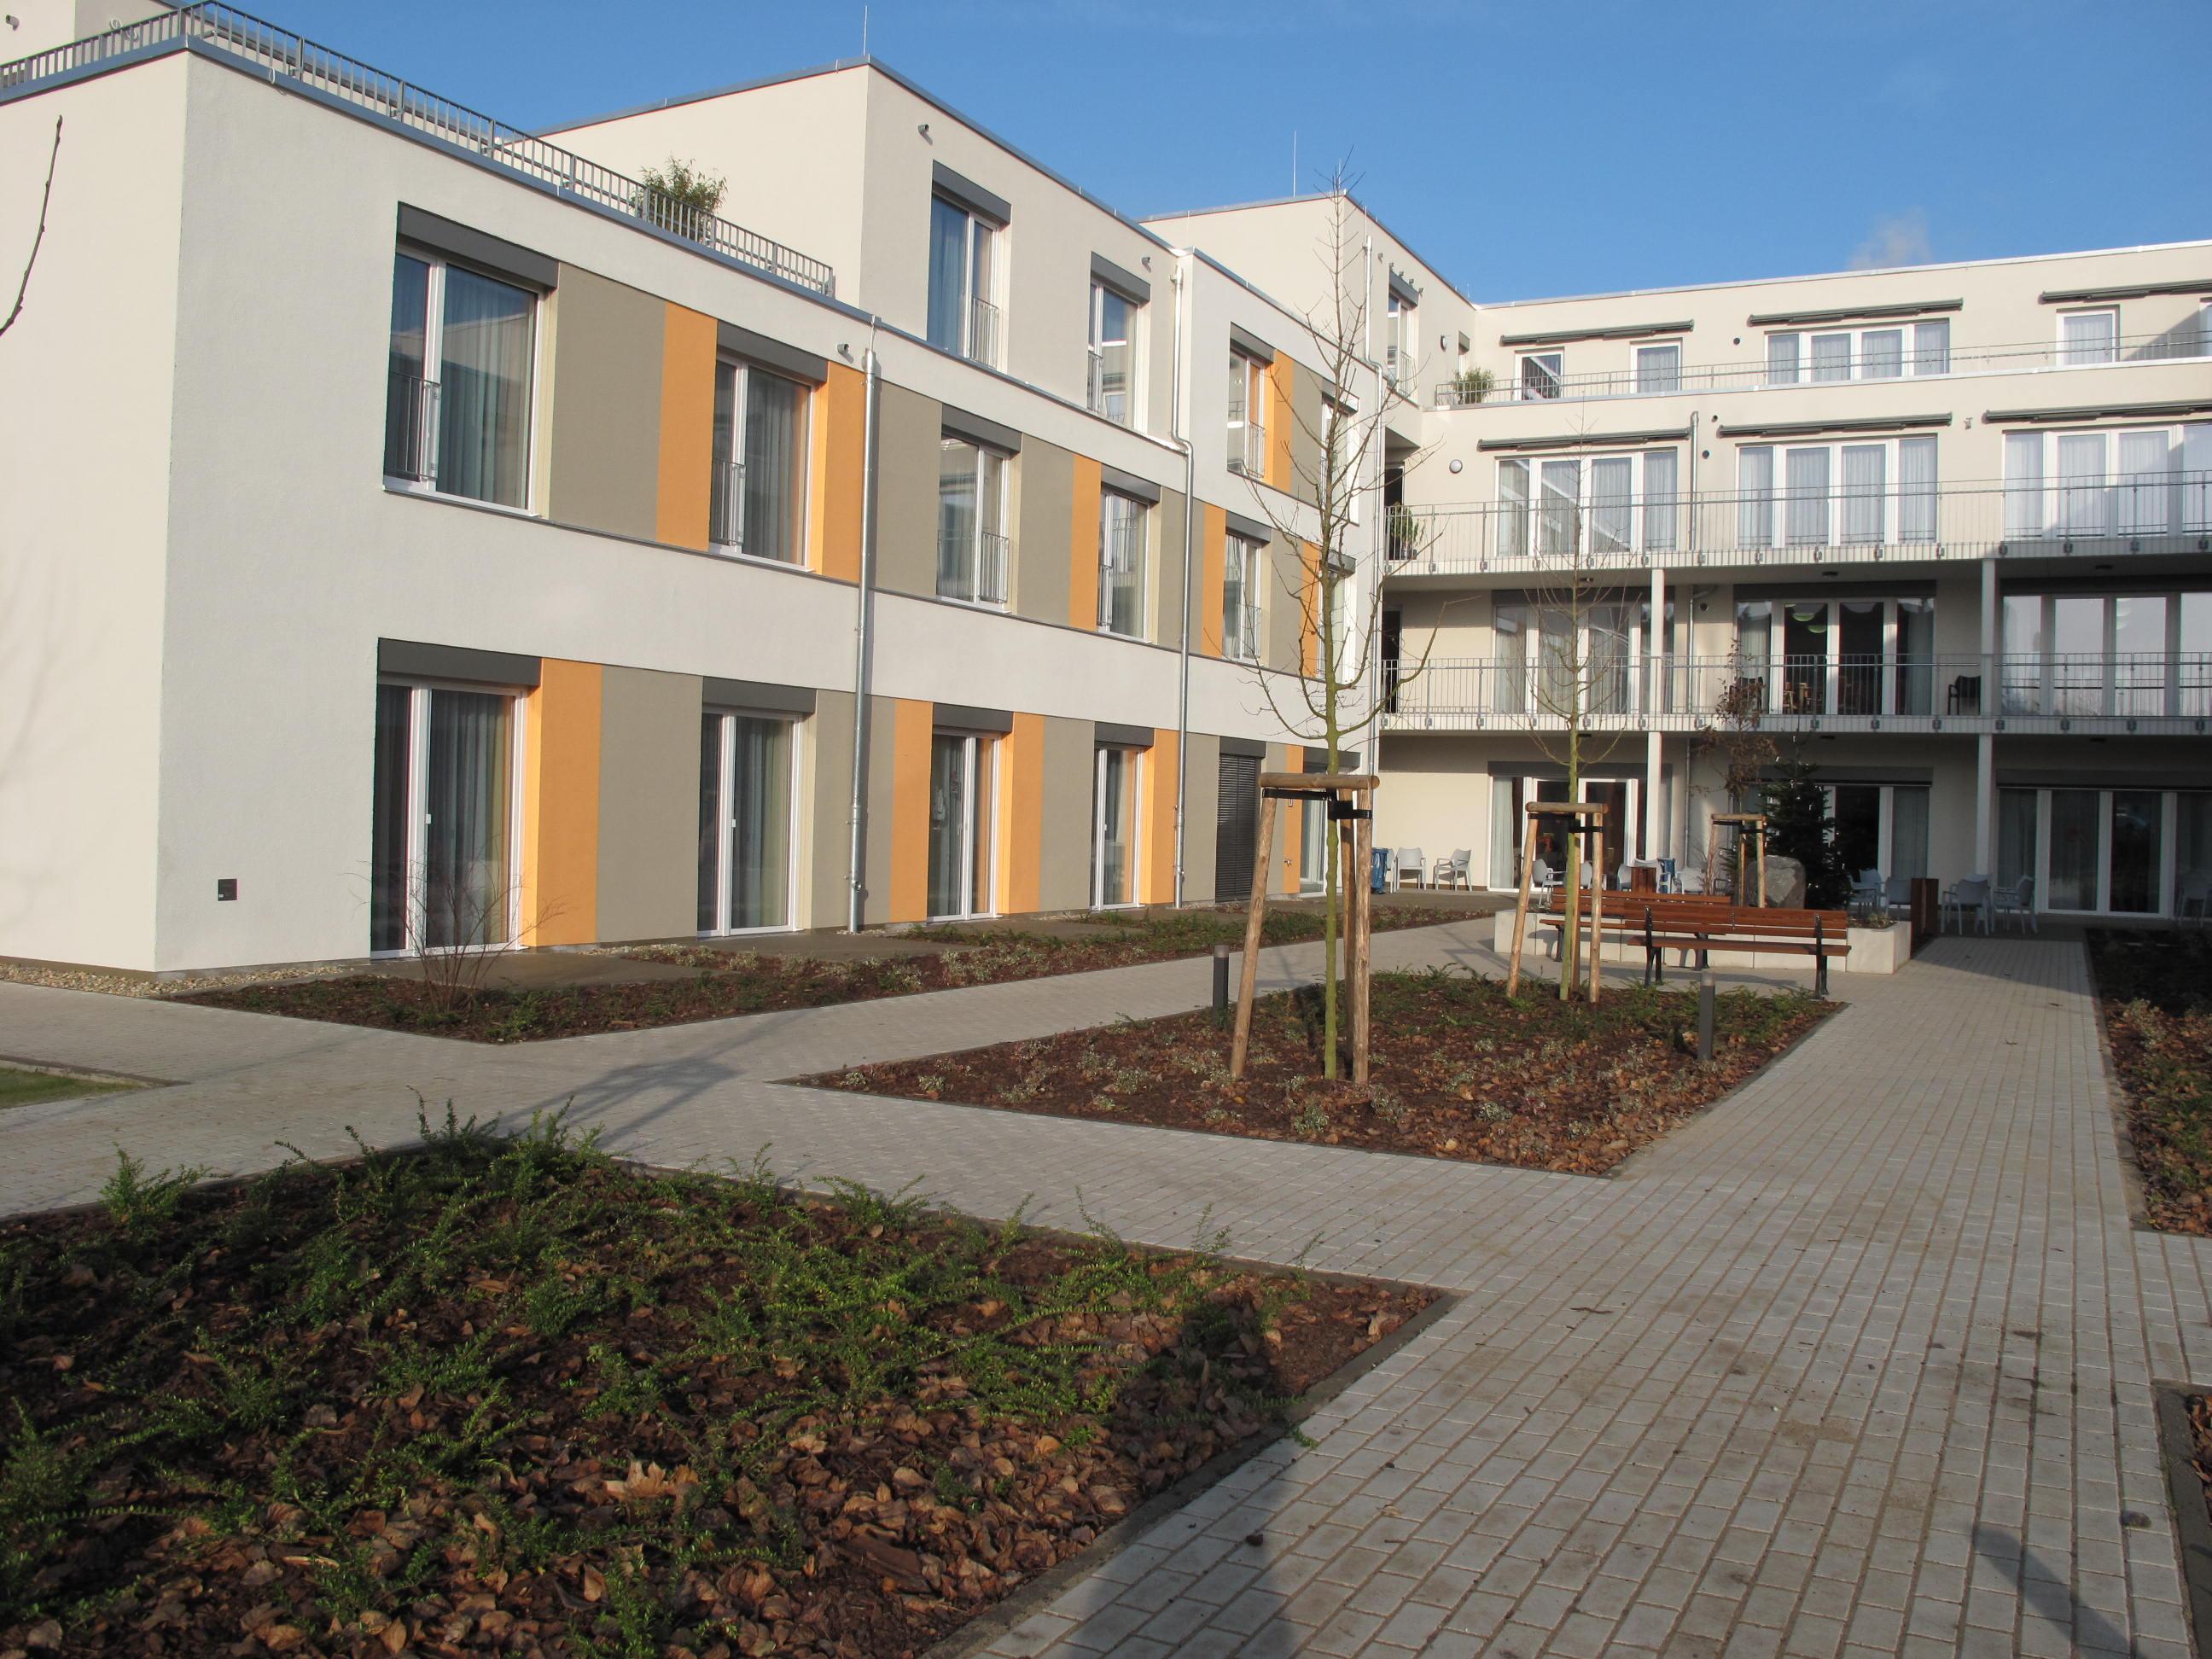 Haus Spreetalhof Berlin-Altglienicke